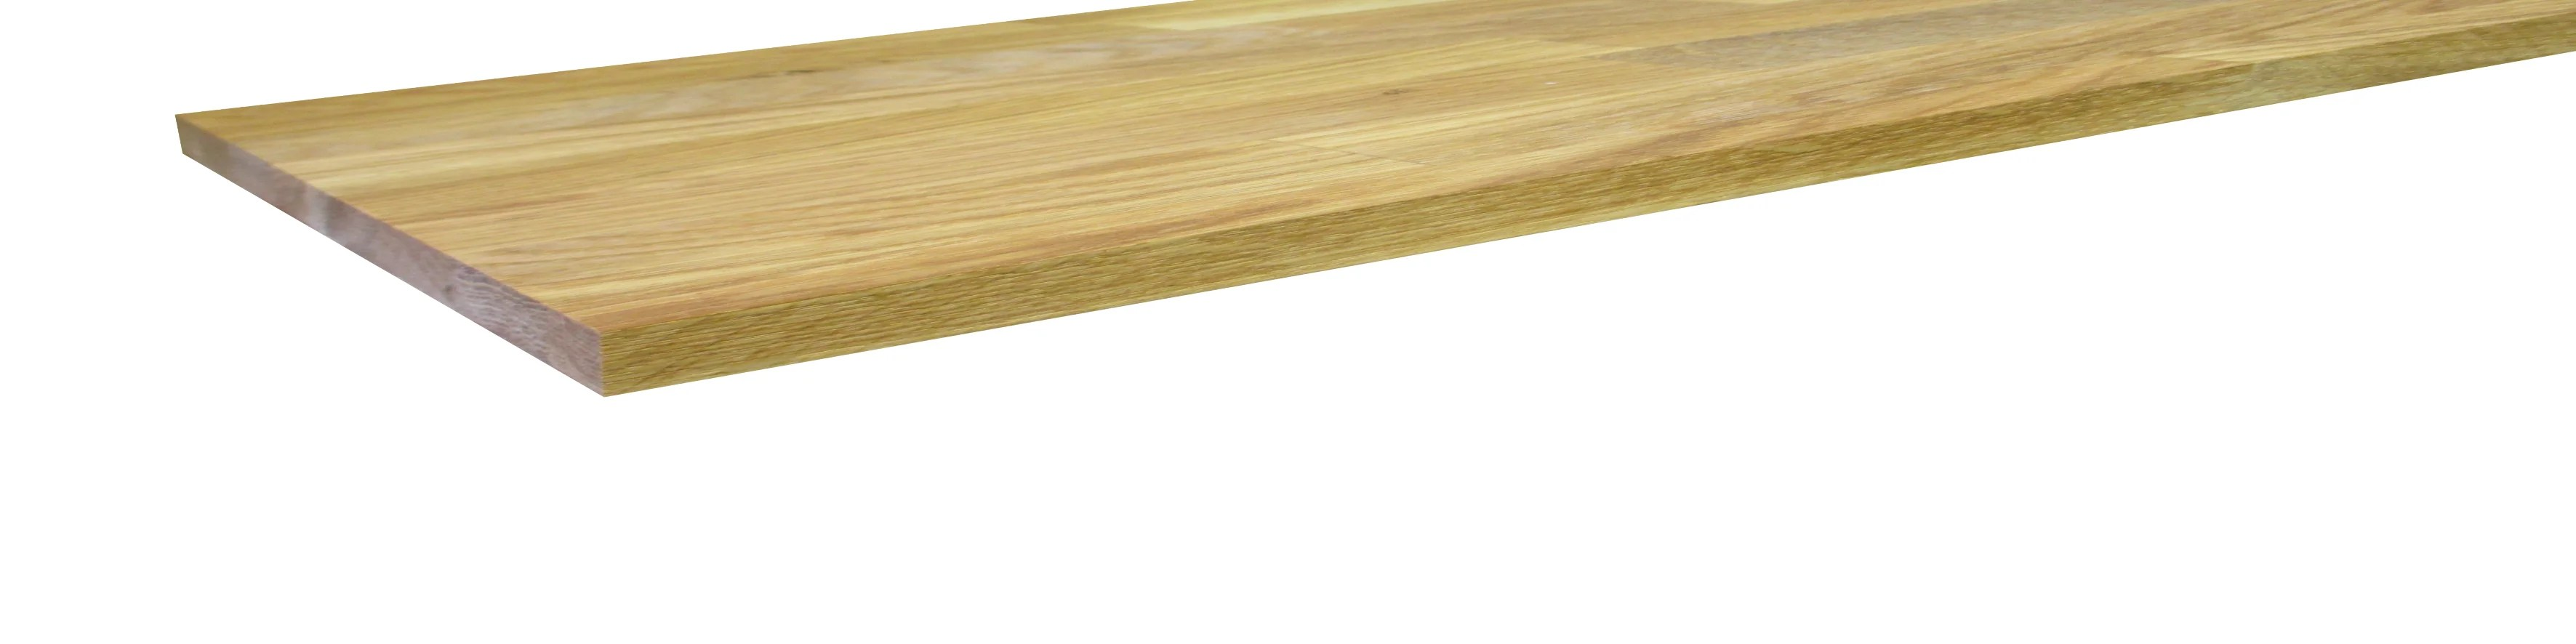 planche bois 40 x 200 leroy merlin